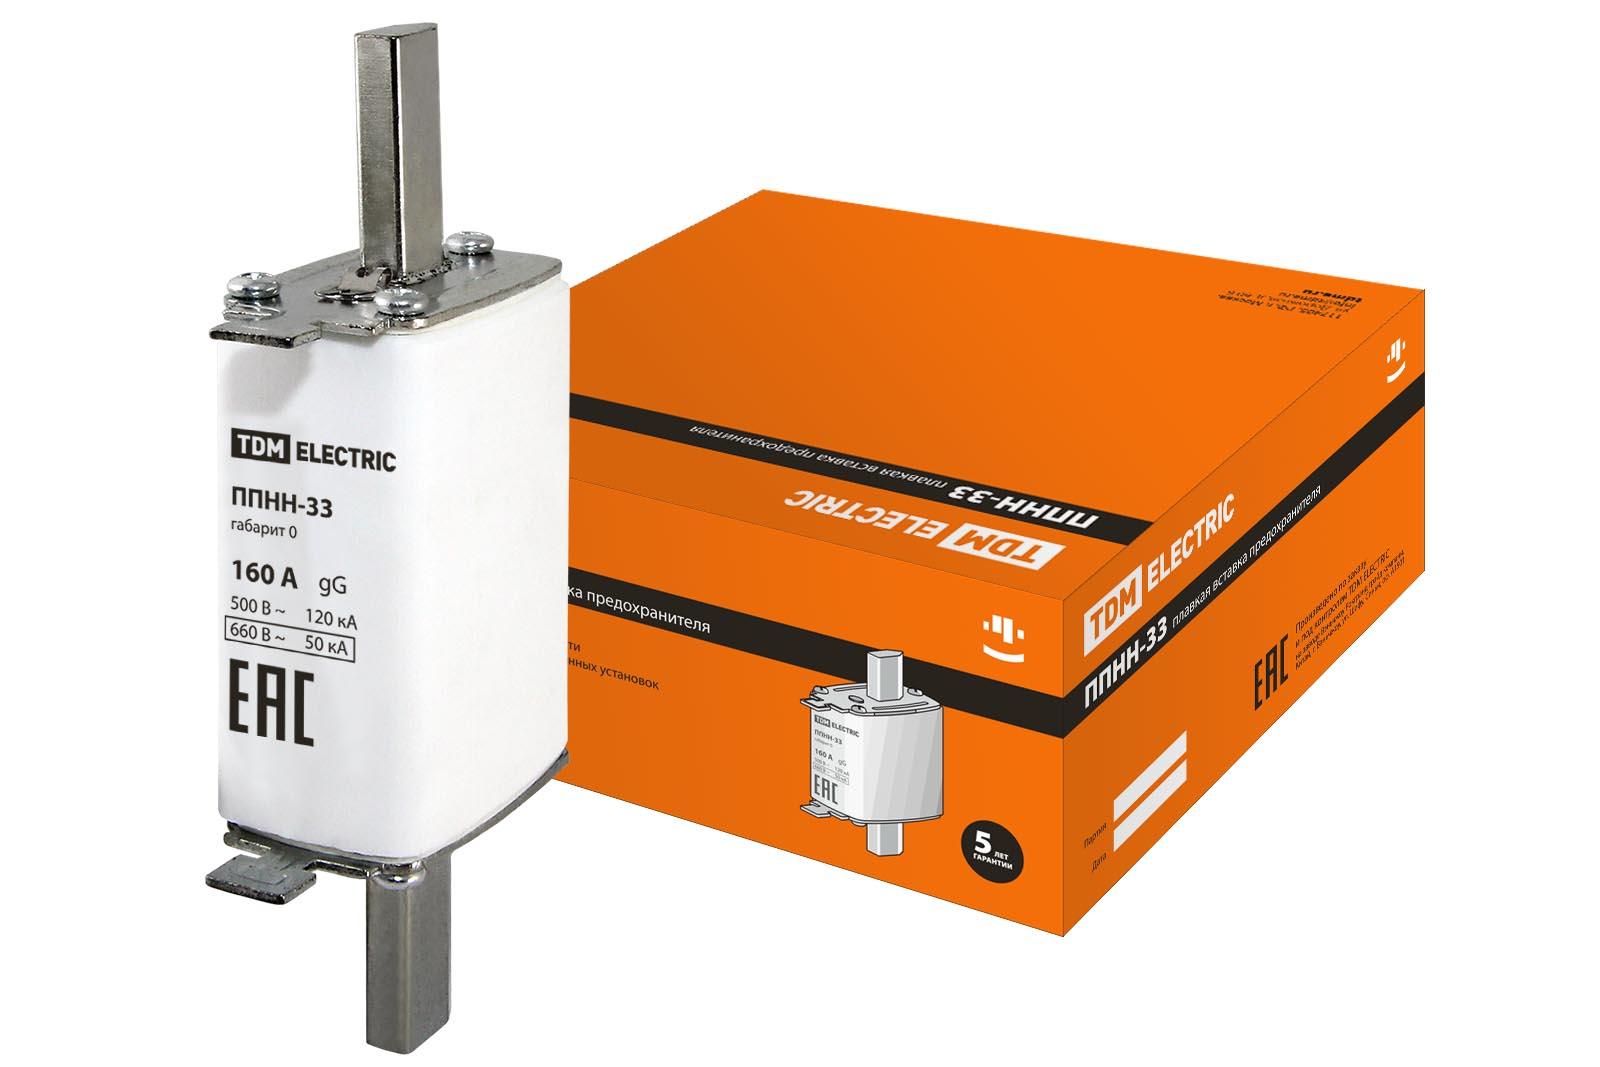 TDM Предохранитель ППНН-33 габ.0, 160А SQ0713-0018 TDM Electric